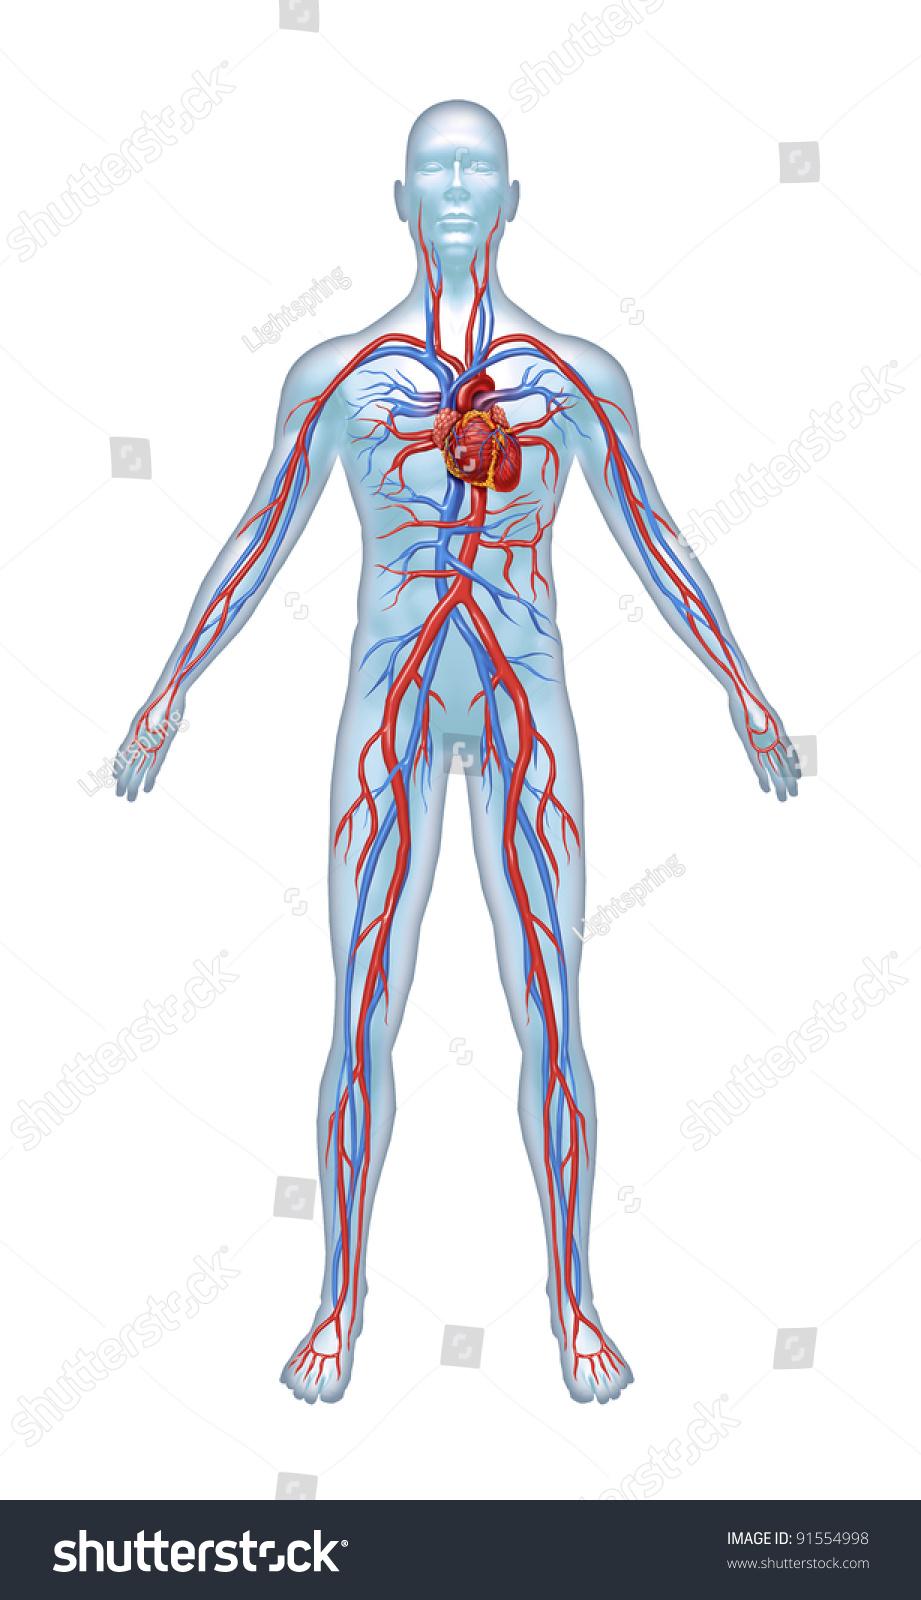 Cardiac Vein Anatomy Diagram